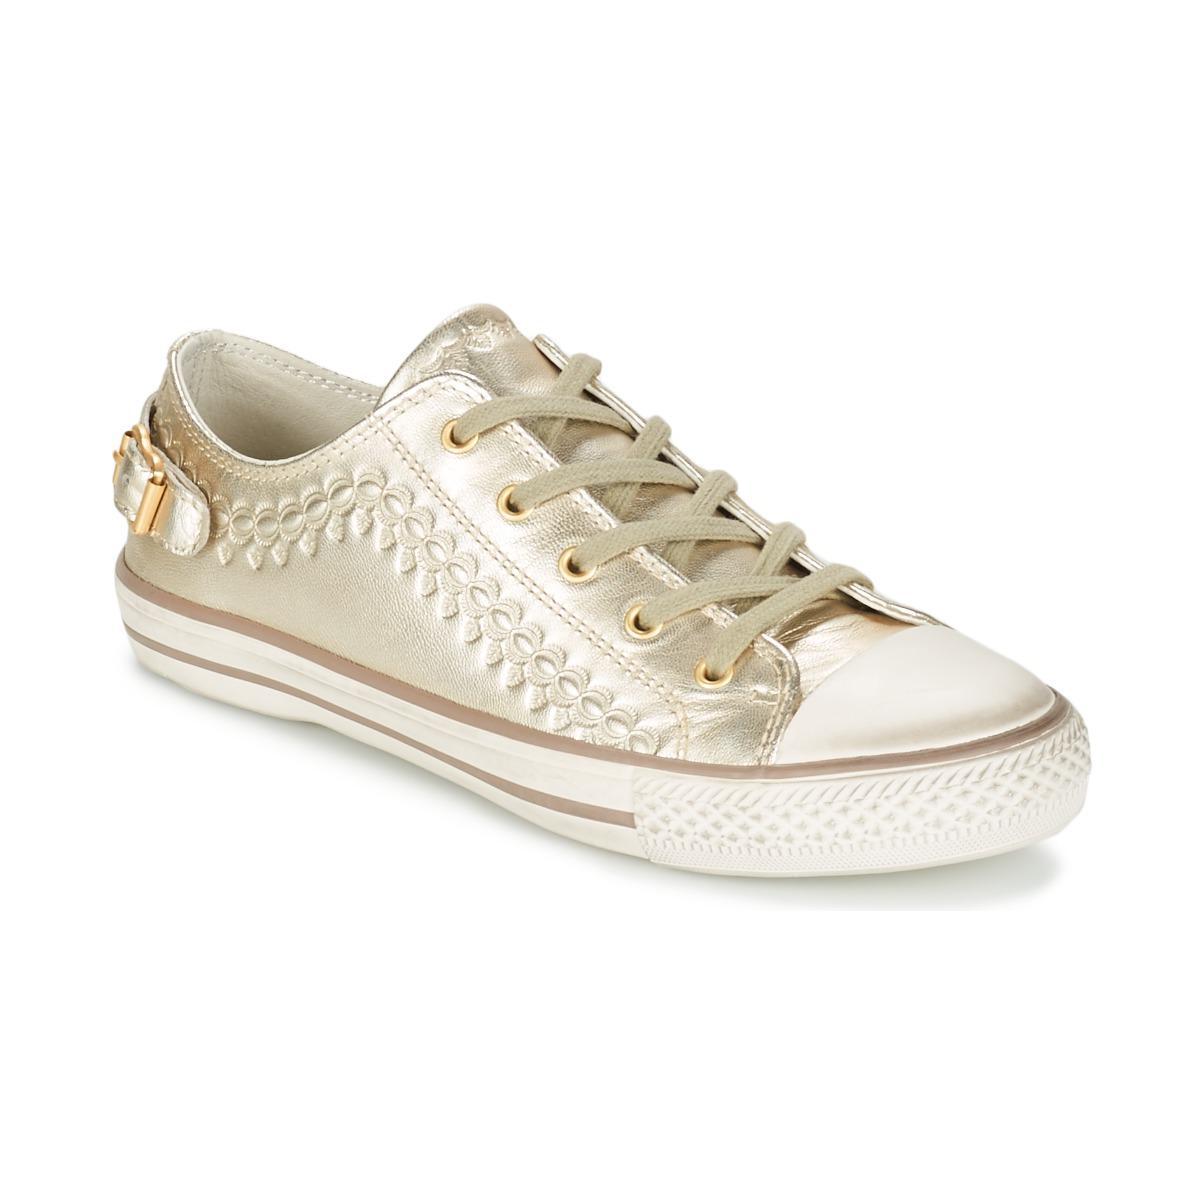 Buy Cheap Store Cheap Cheap Online Ash VIRGO women's Shoes (Trainers) in Geniue Stockist Sale Online mOcLvr8pp